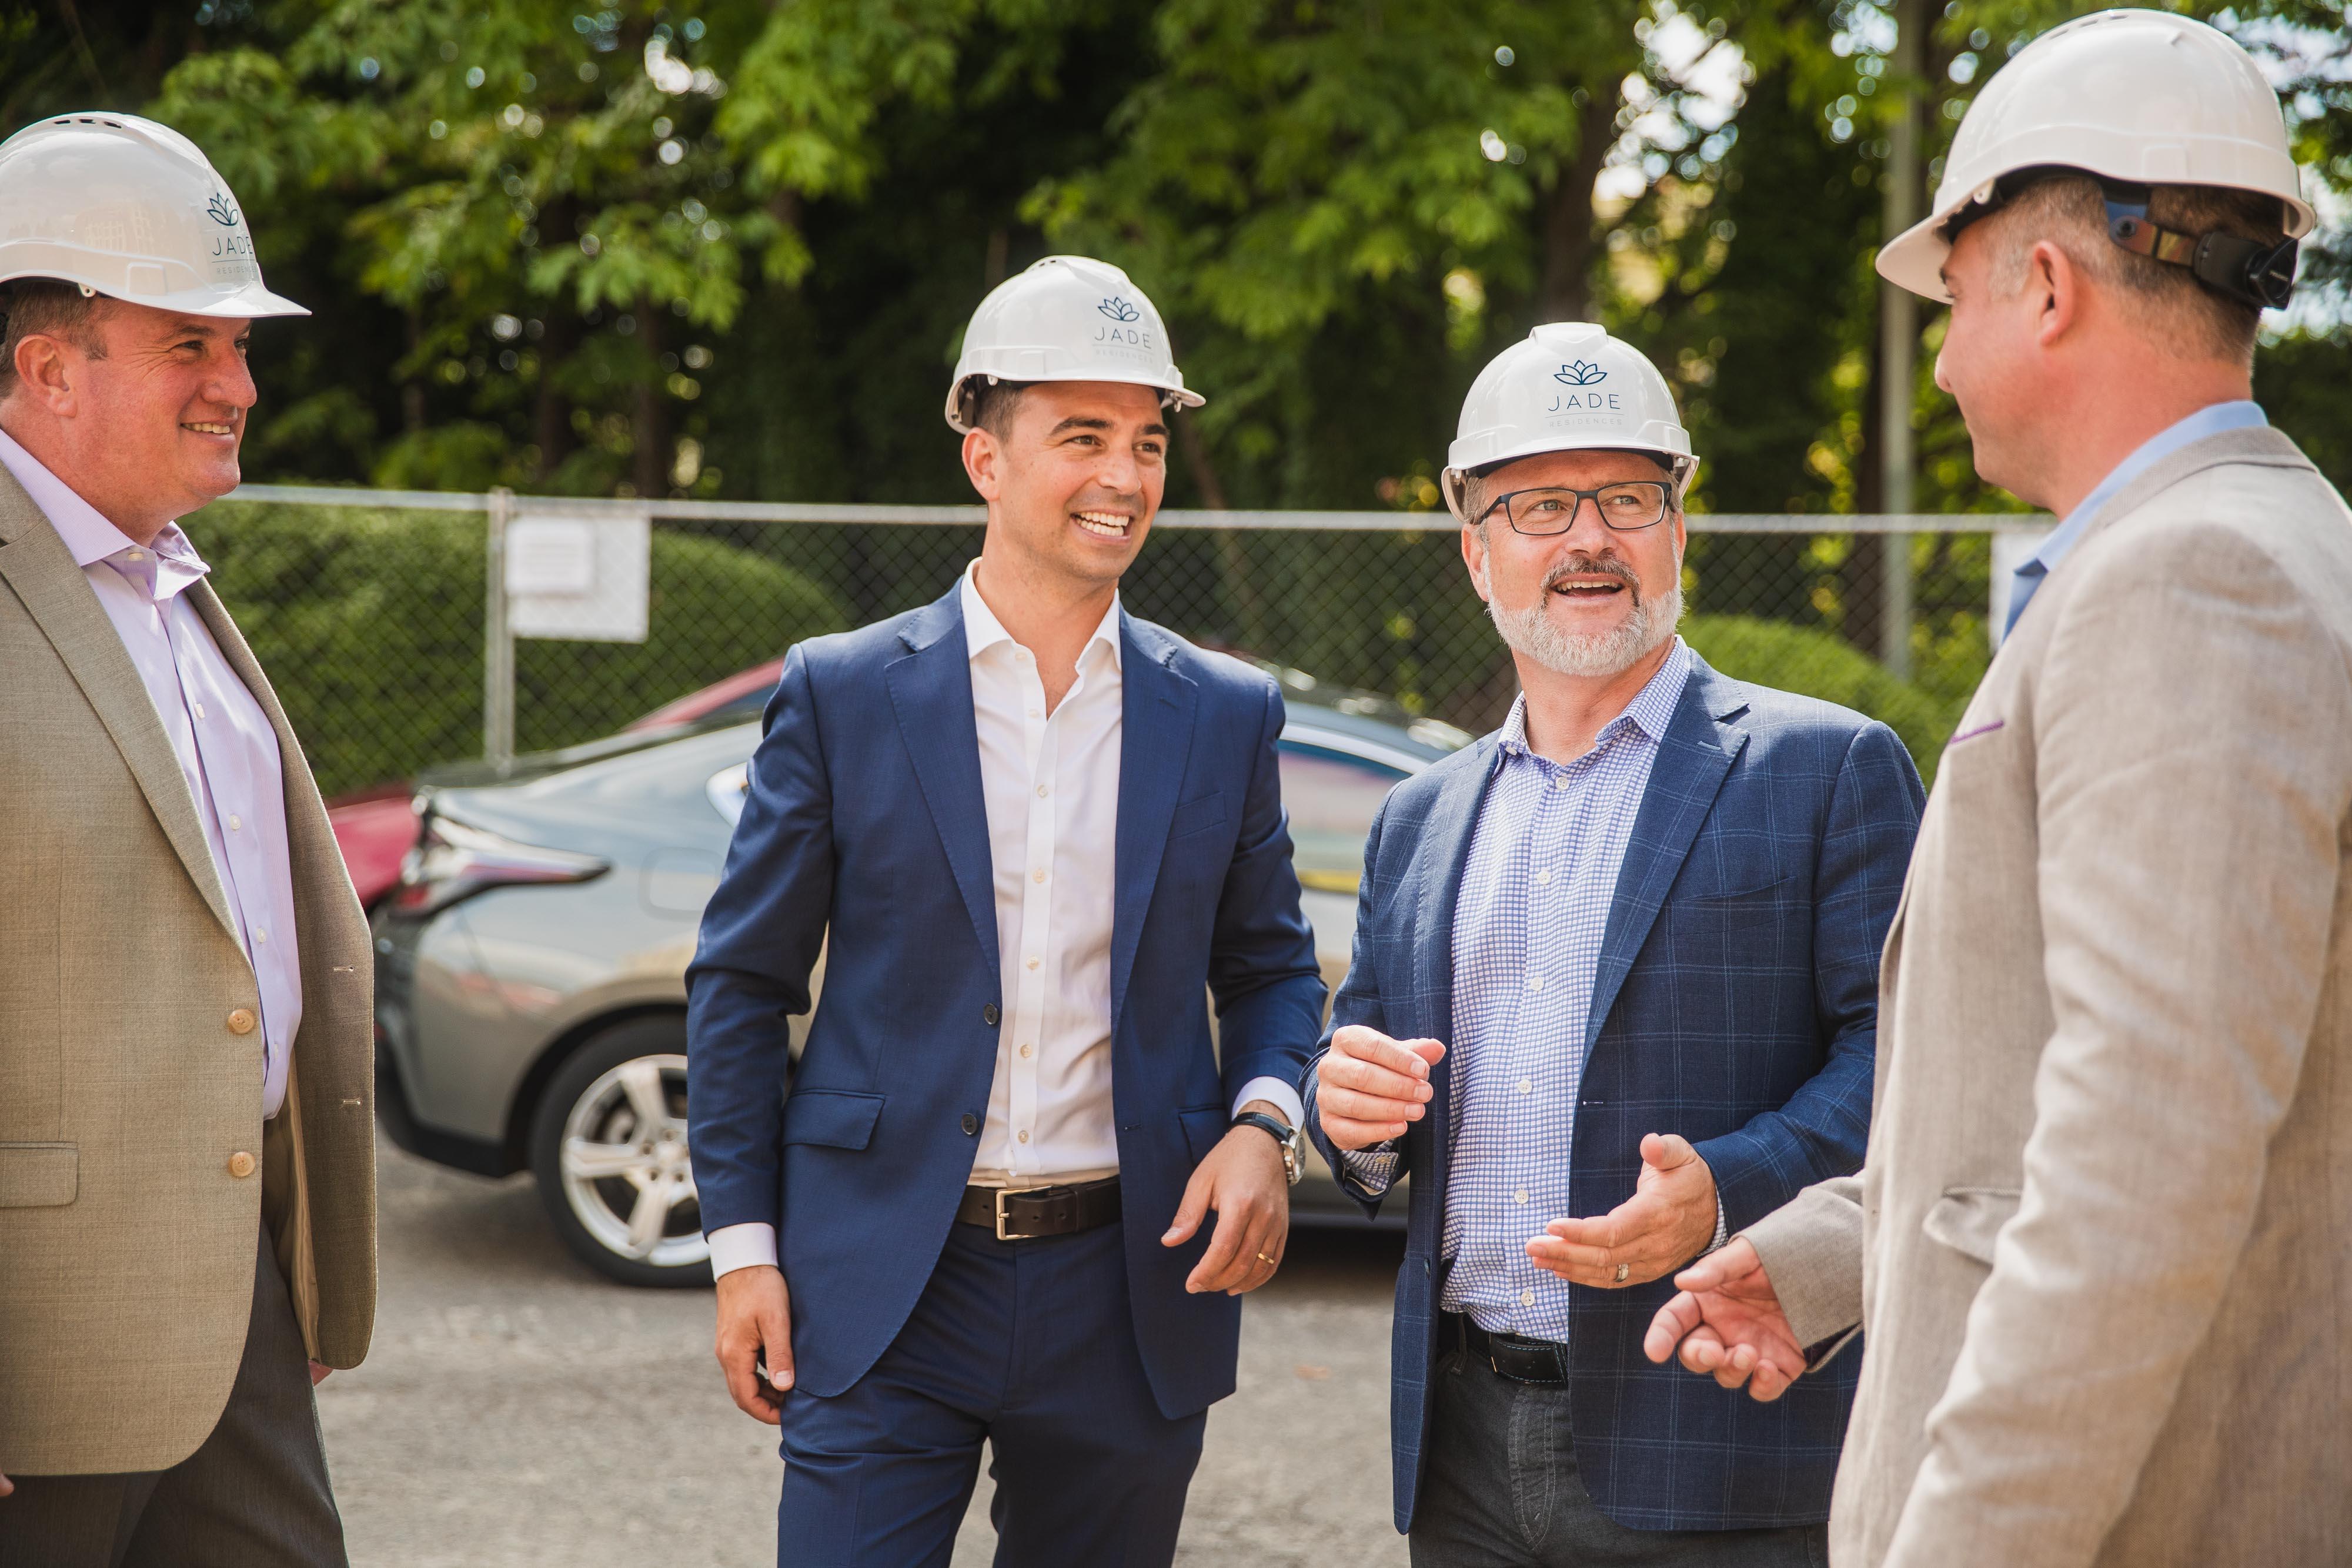 Terrene Urban and Partners Celebrate Kirkland Groundbreaking for JADE Residences | Jade Residences 14